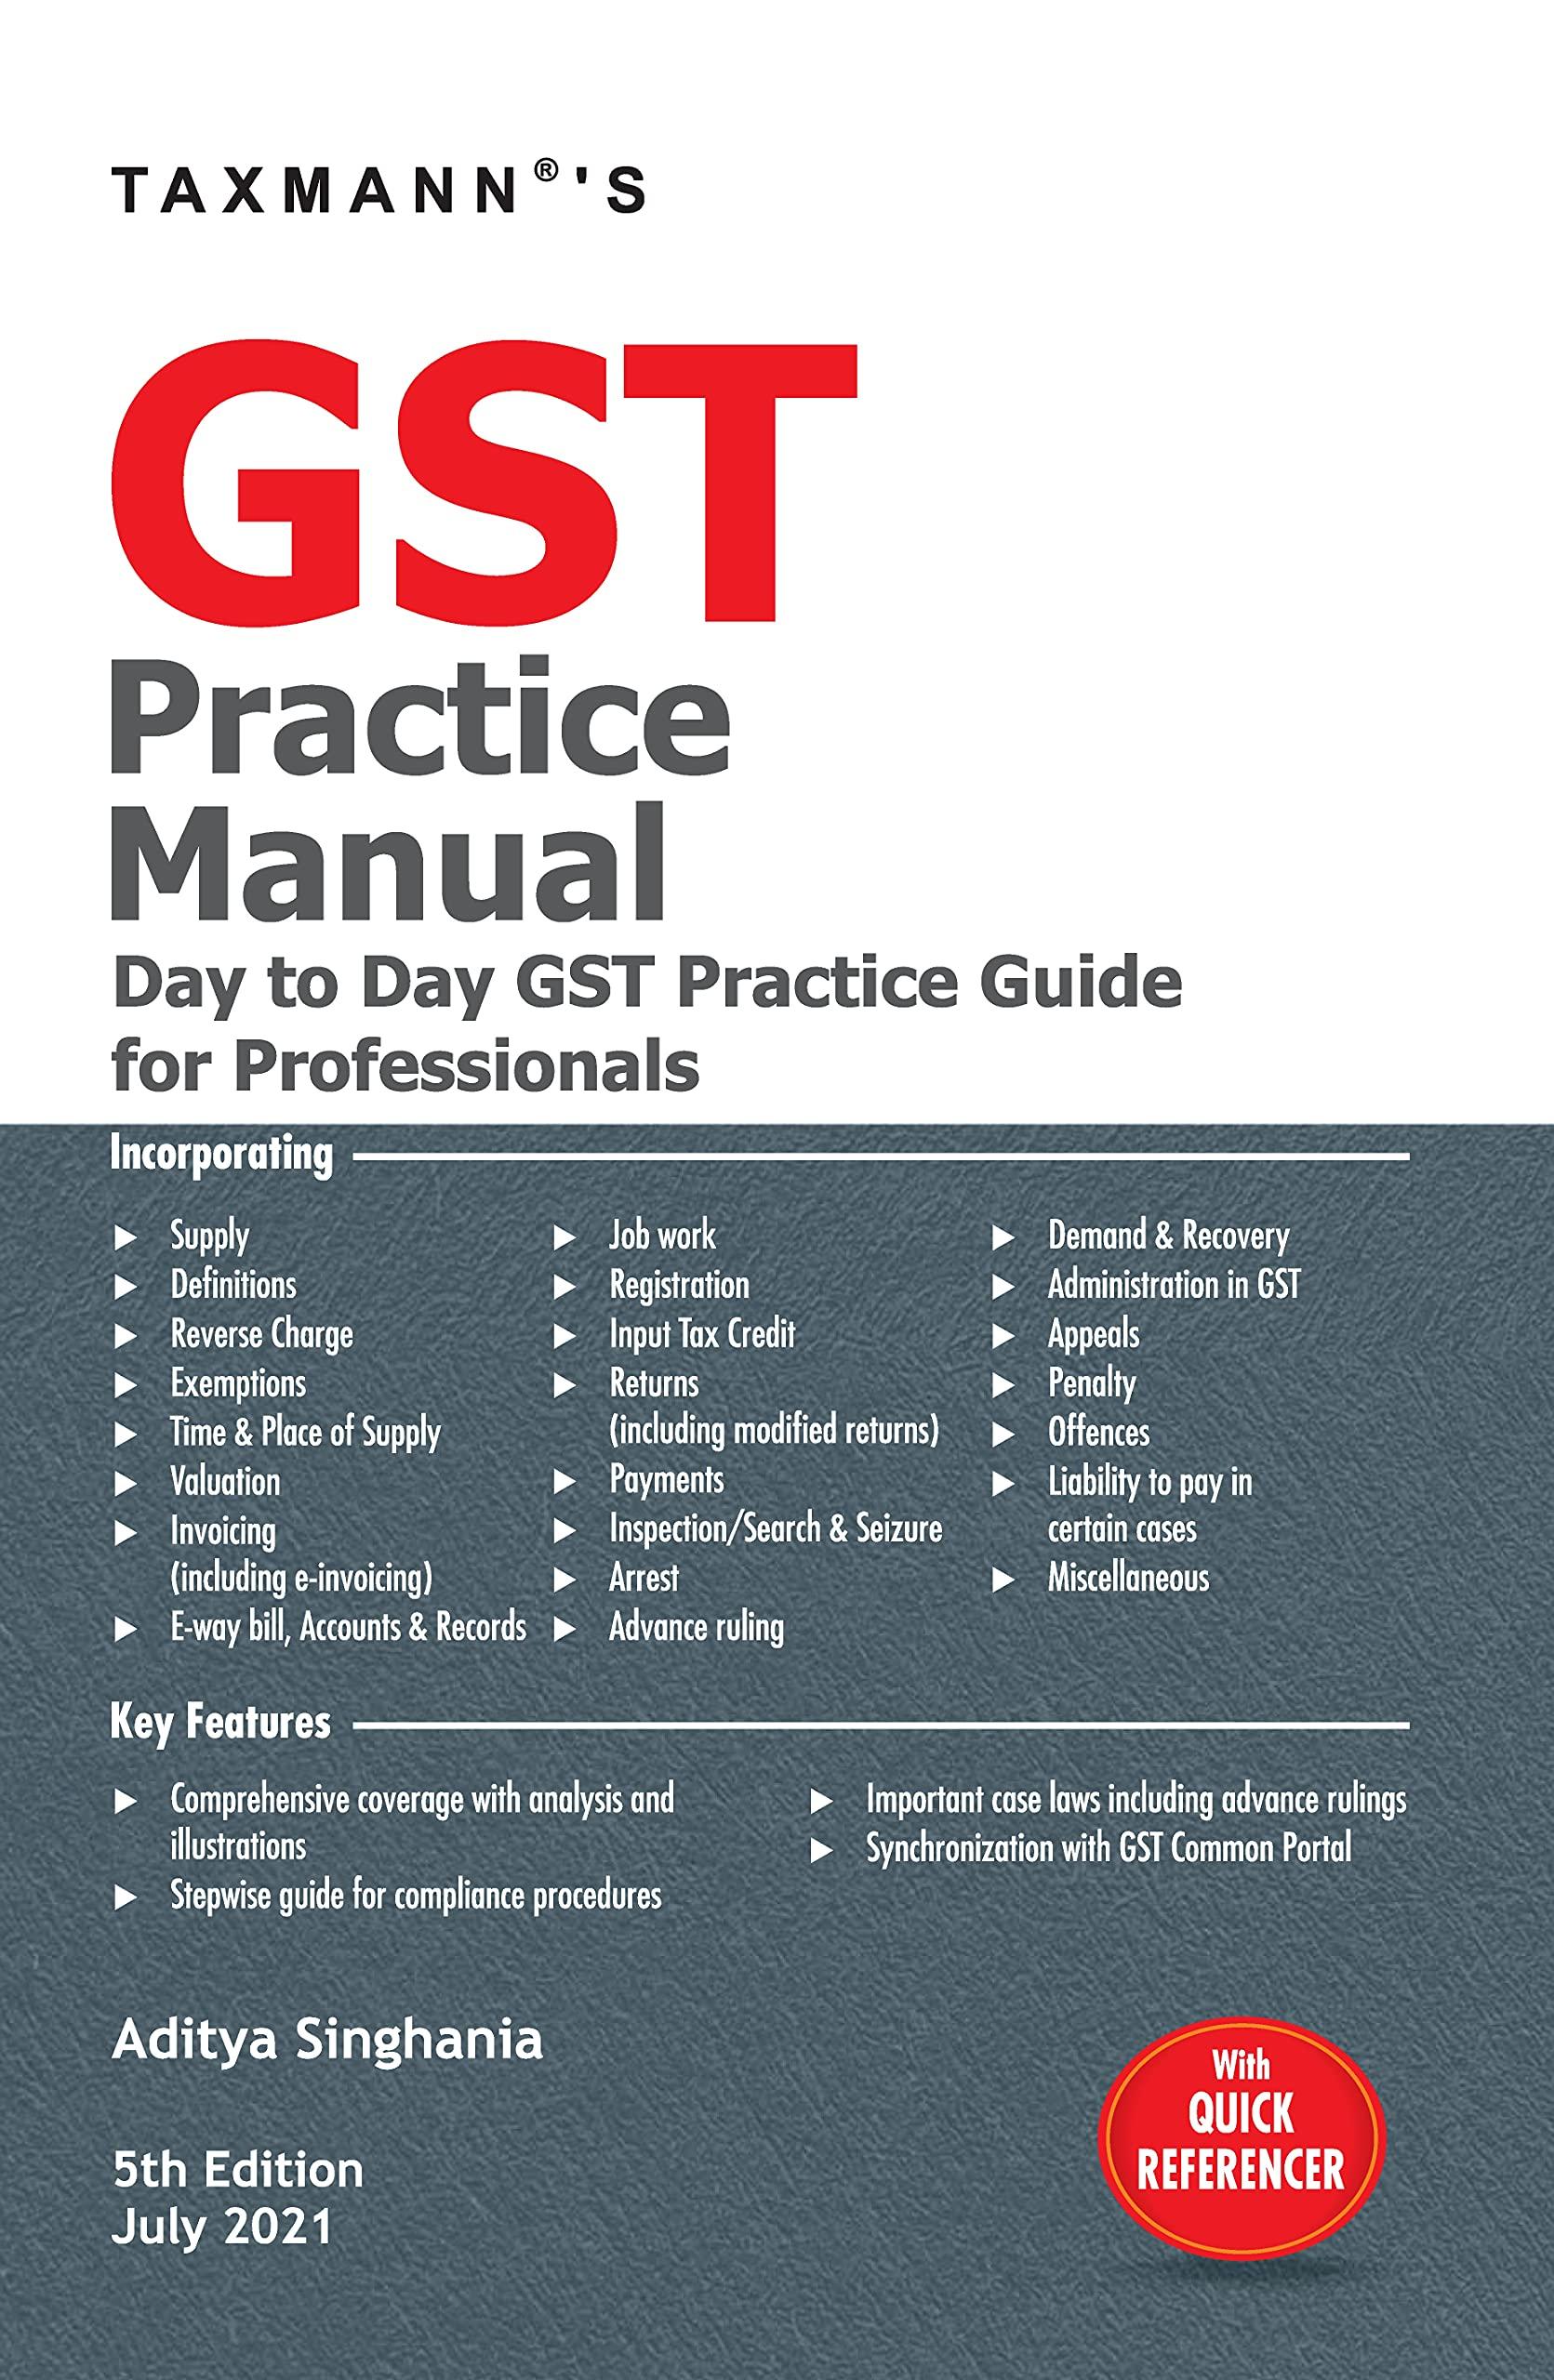 Taxmann GST Practice Manual 2021